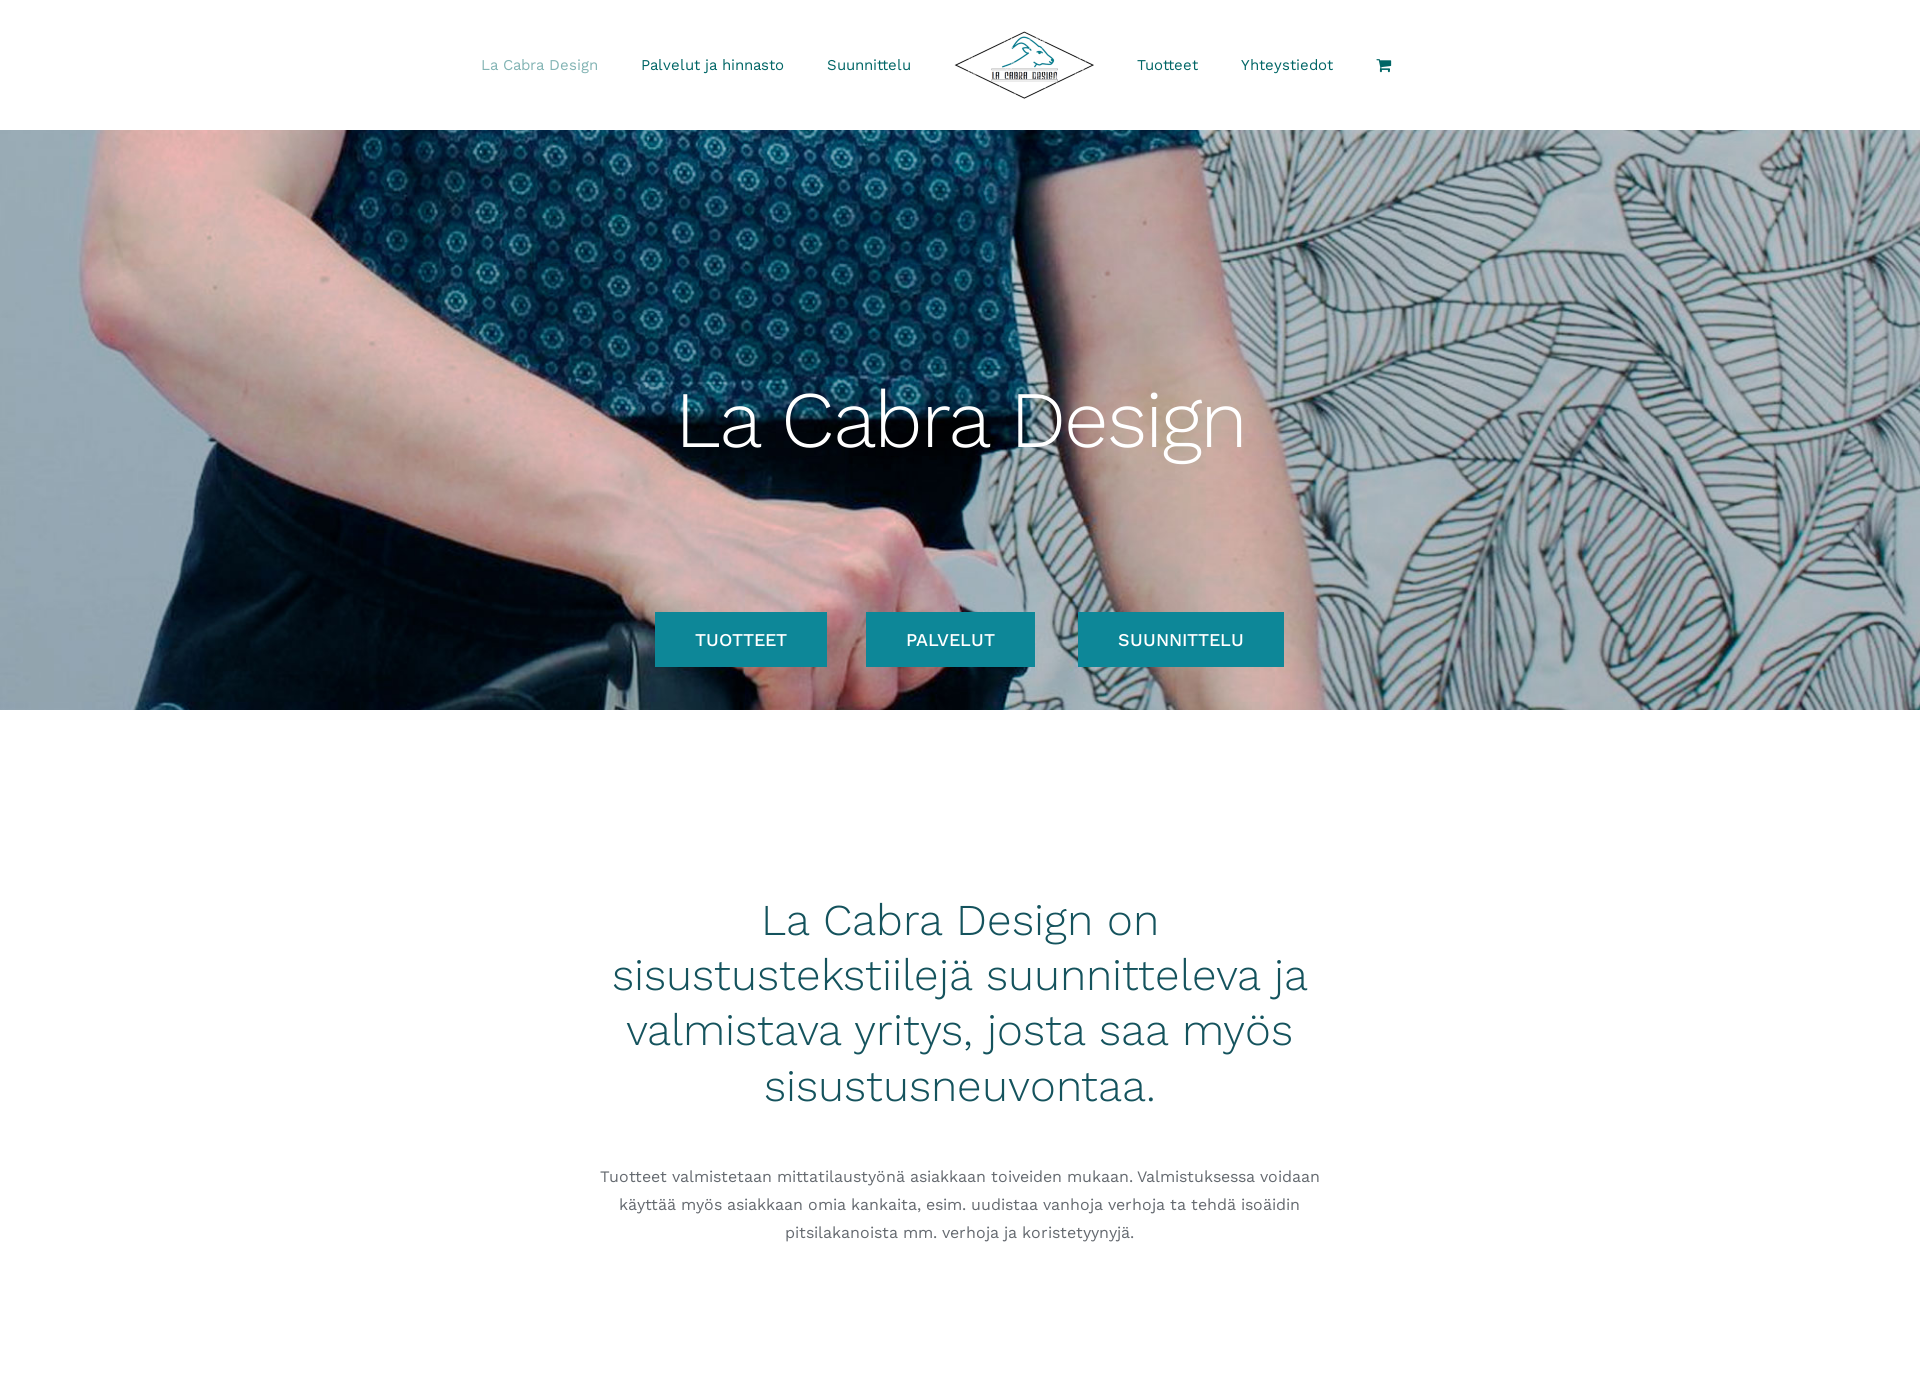 Skärmdump för lacabradesign.fi